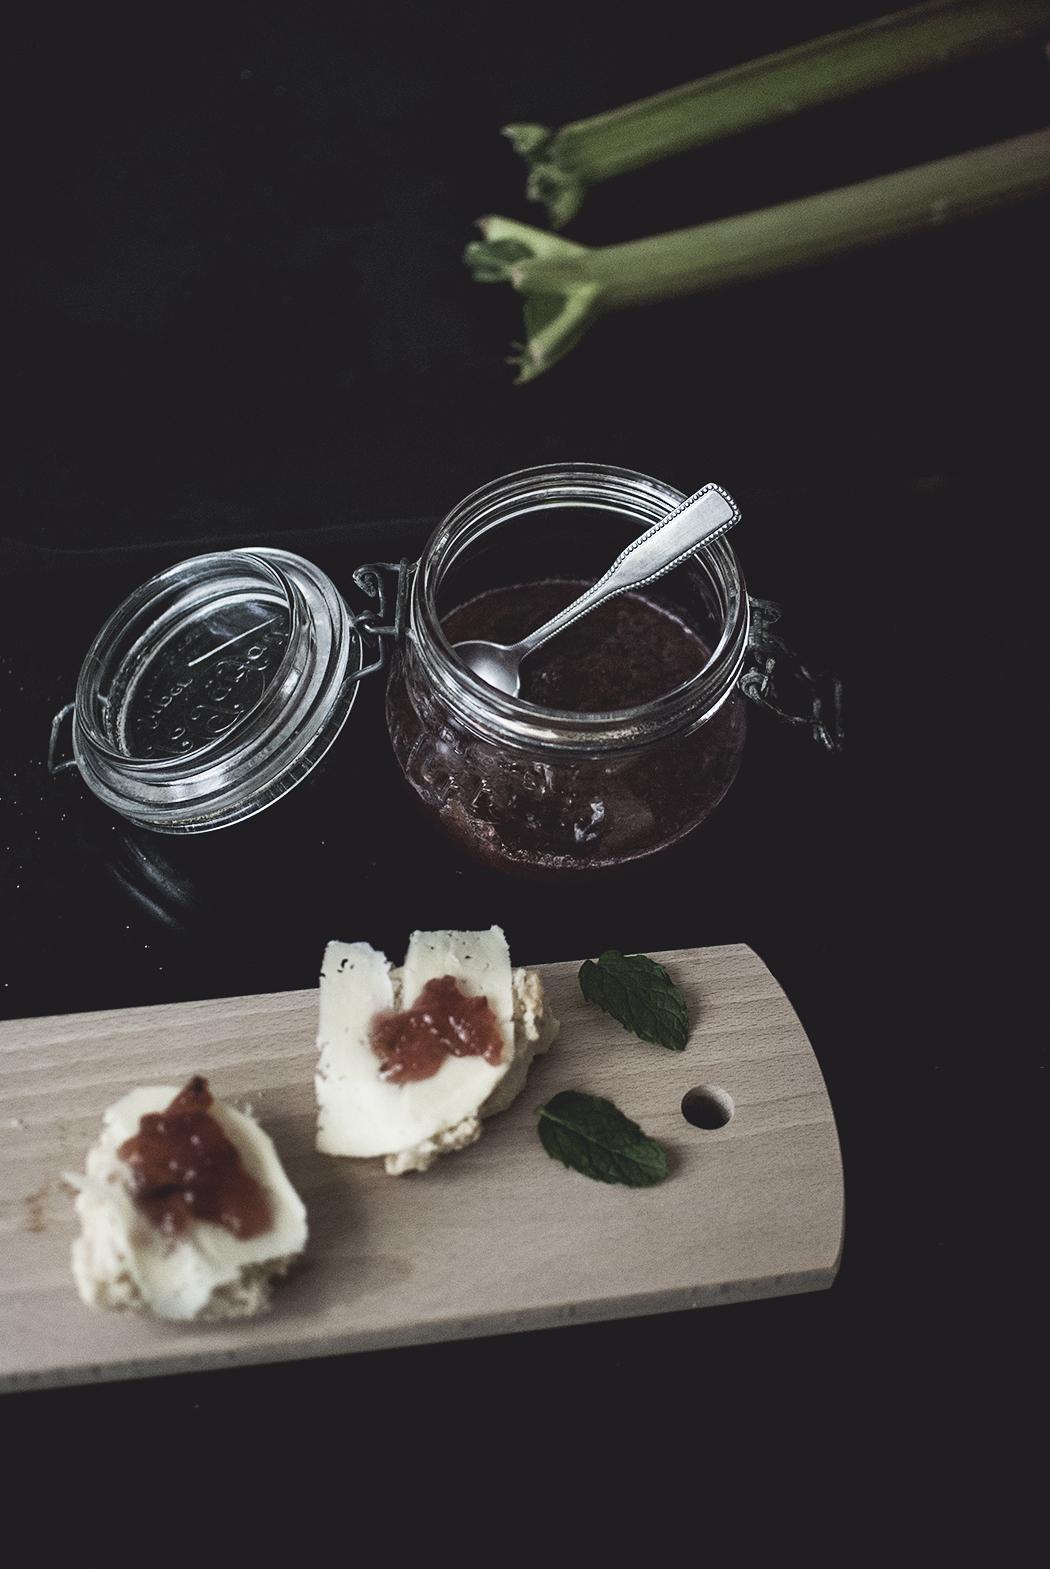 Recept: Rabarbermarmelad